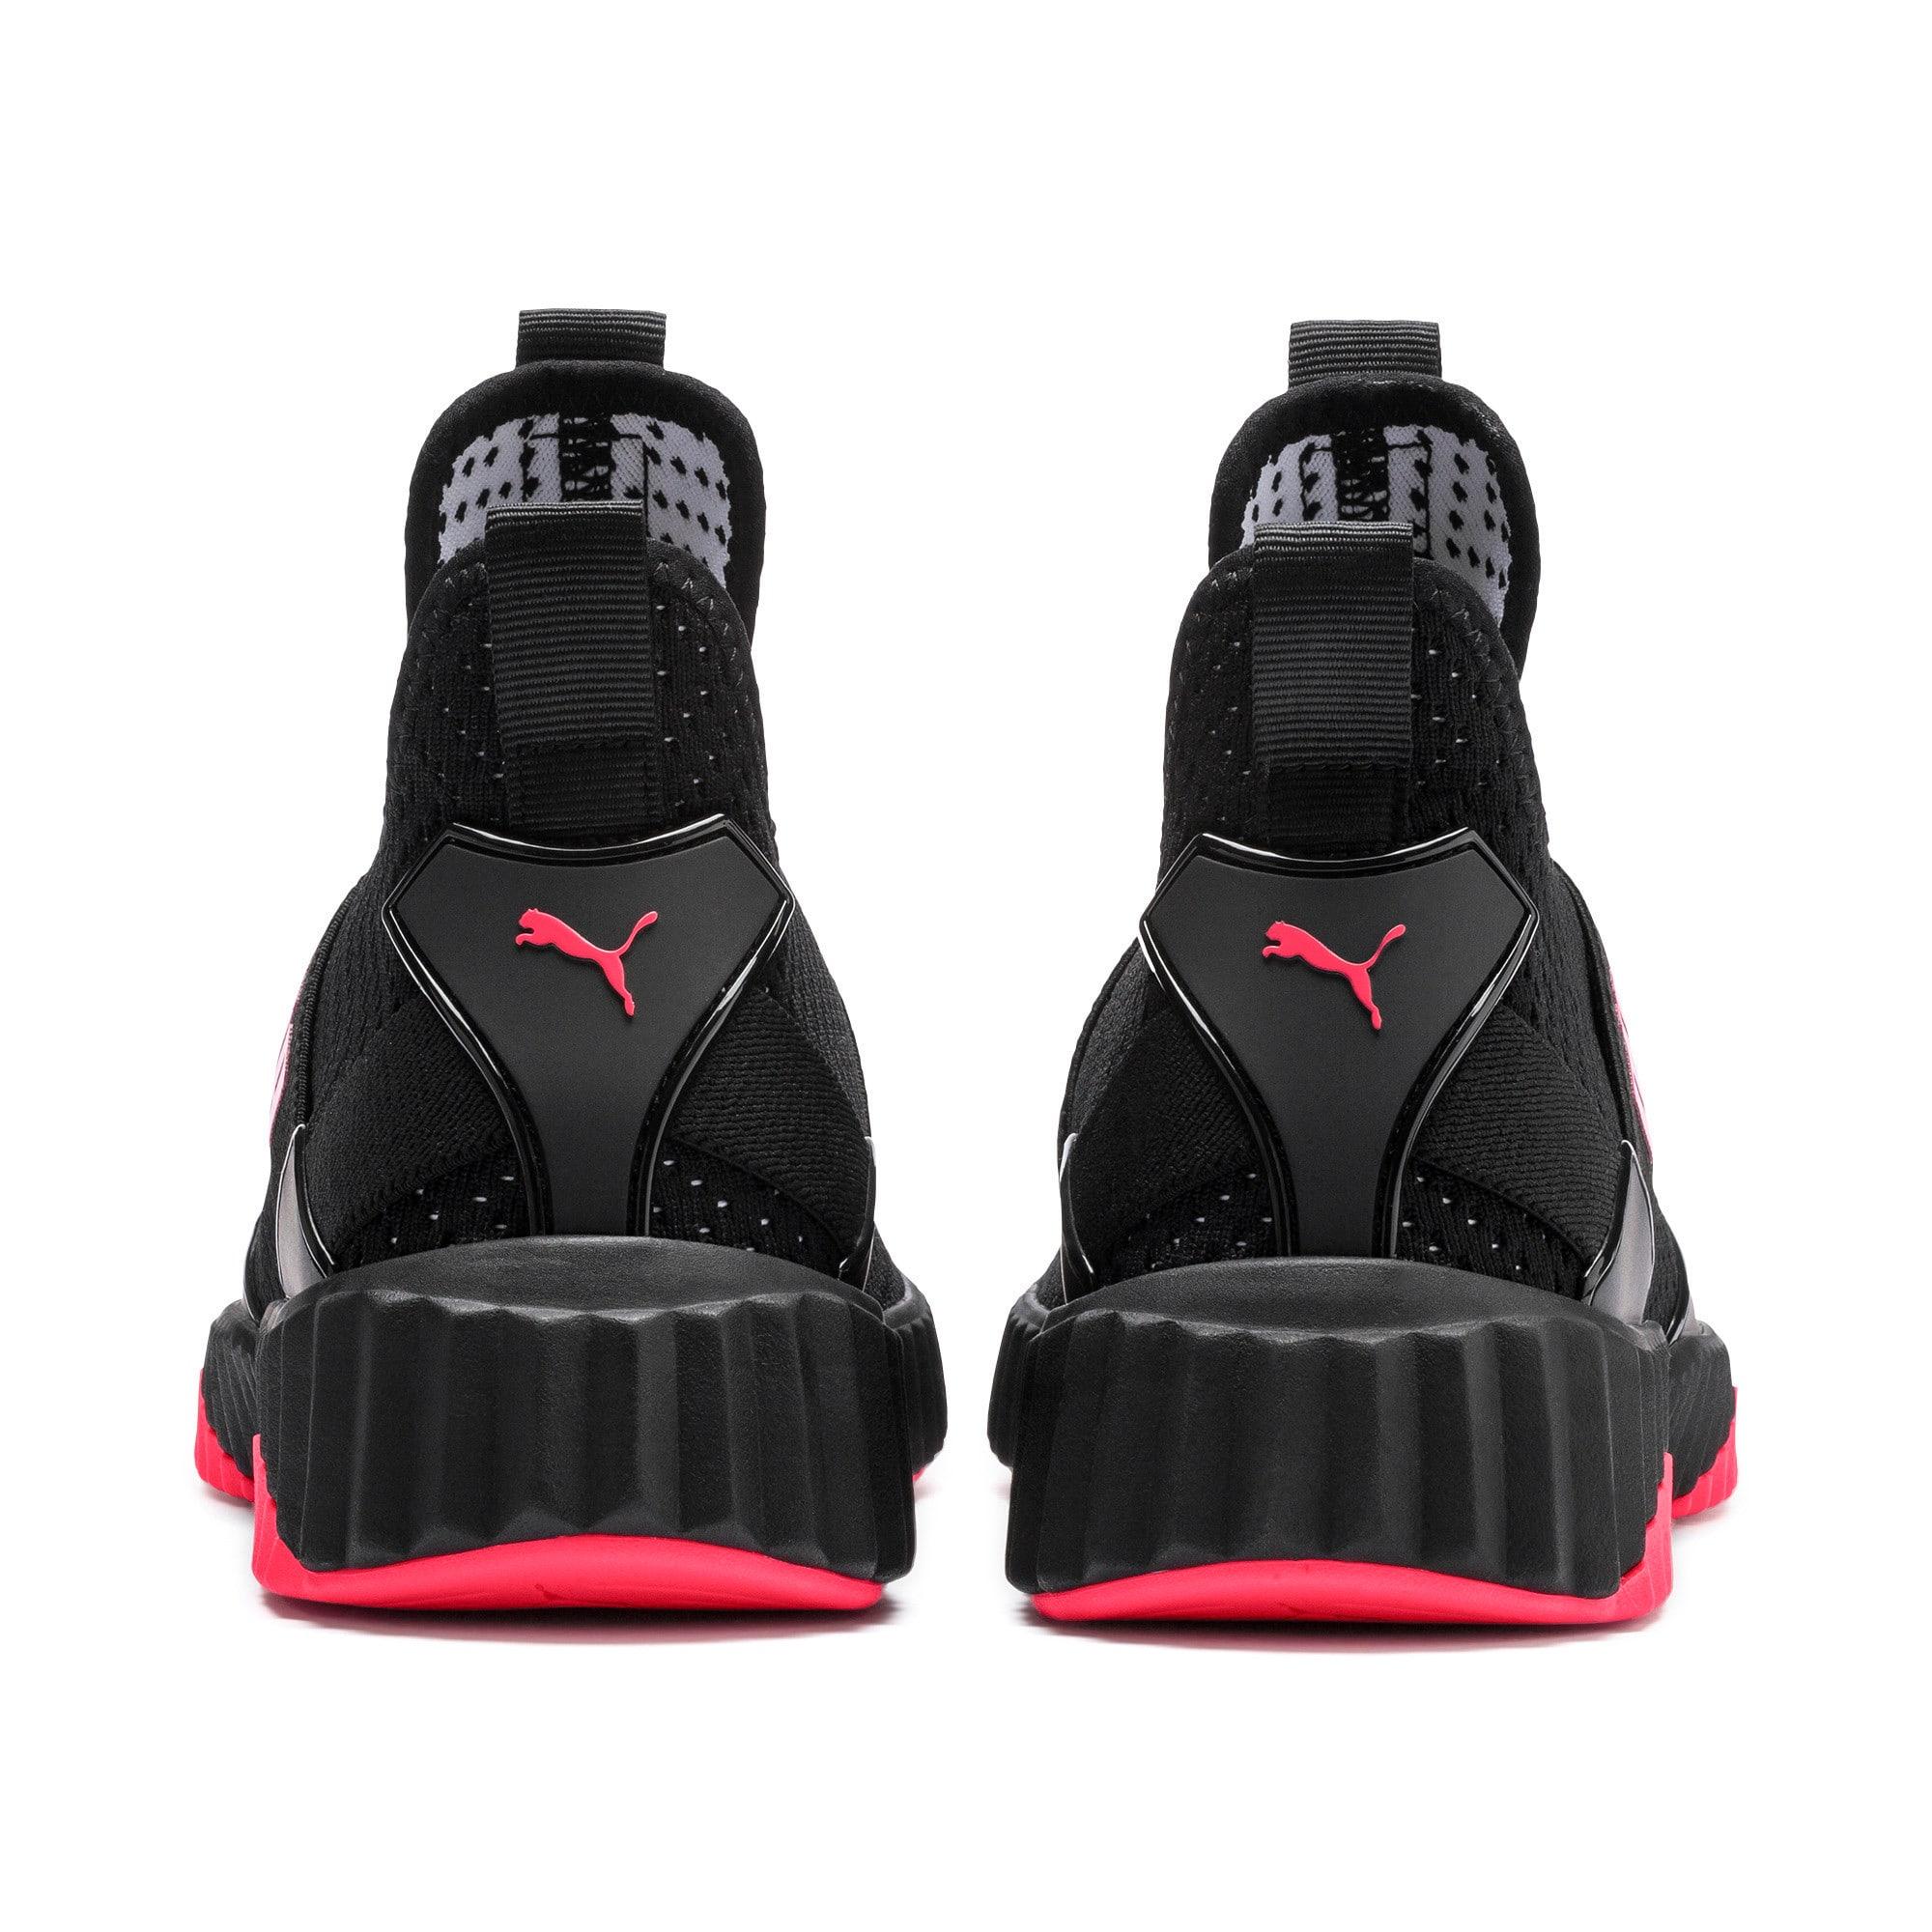 Thumbnail 4 of Defy Mid Core Women's Training Shoes, Puma Black-Pink Alert, medium